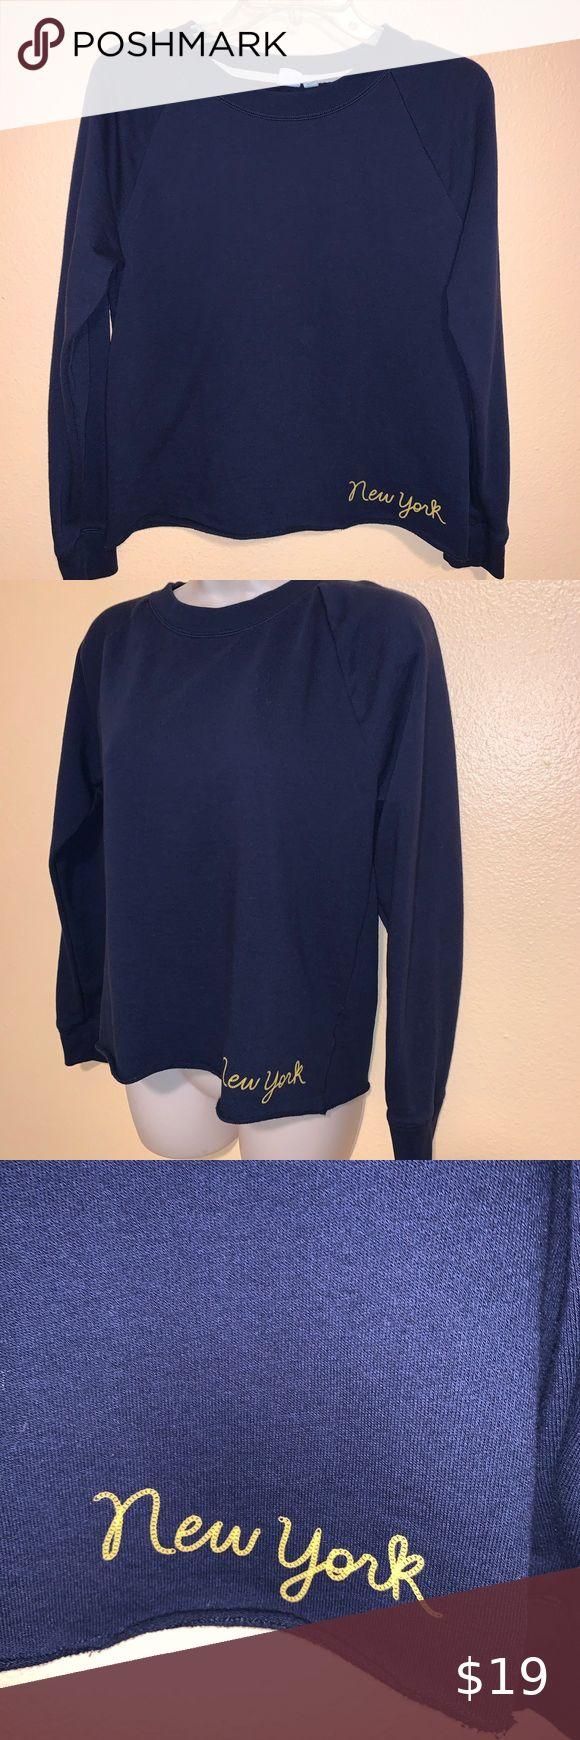 Gap Cotton Blnd Sweatshirt Top Navy S New York Sweatshirt Tops Sweatshirts Tops [ 1740 x 580 Pixel ]